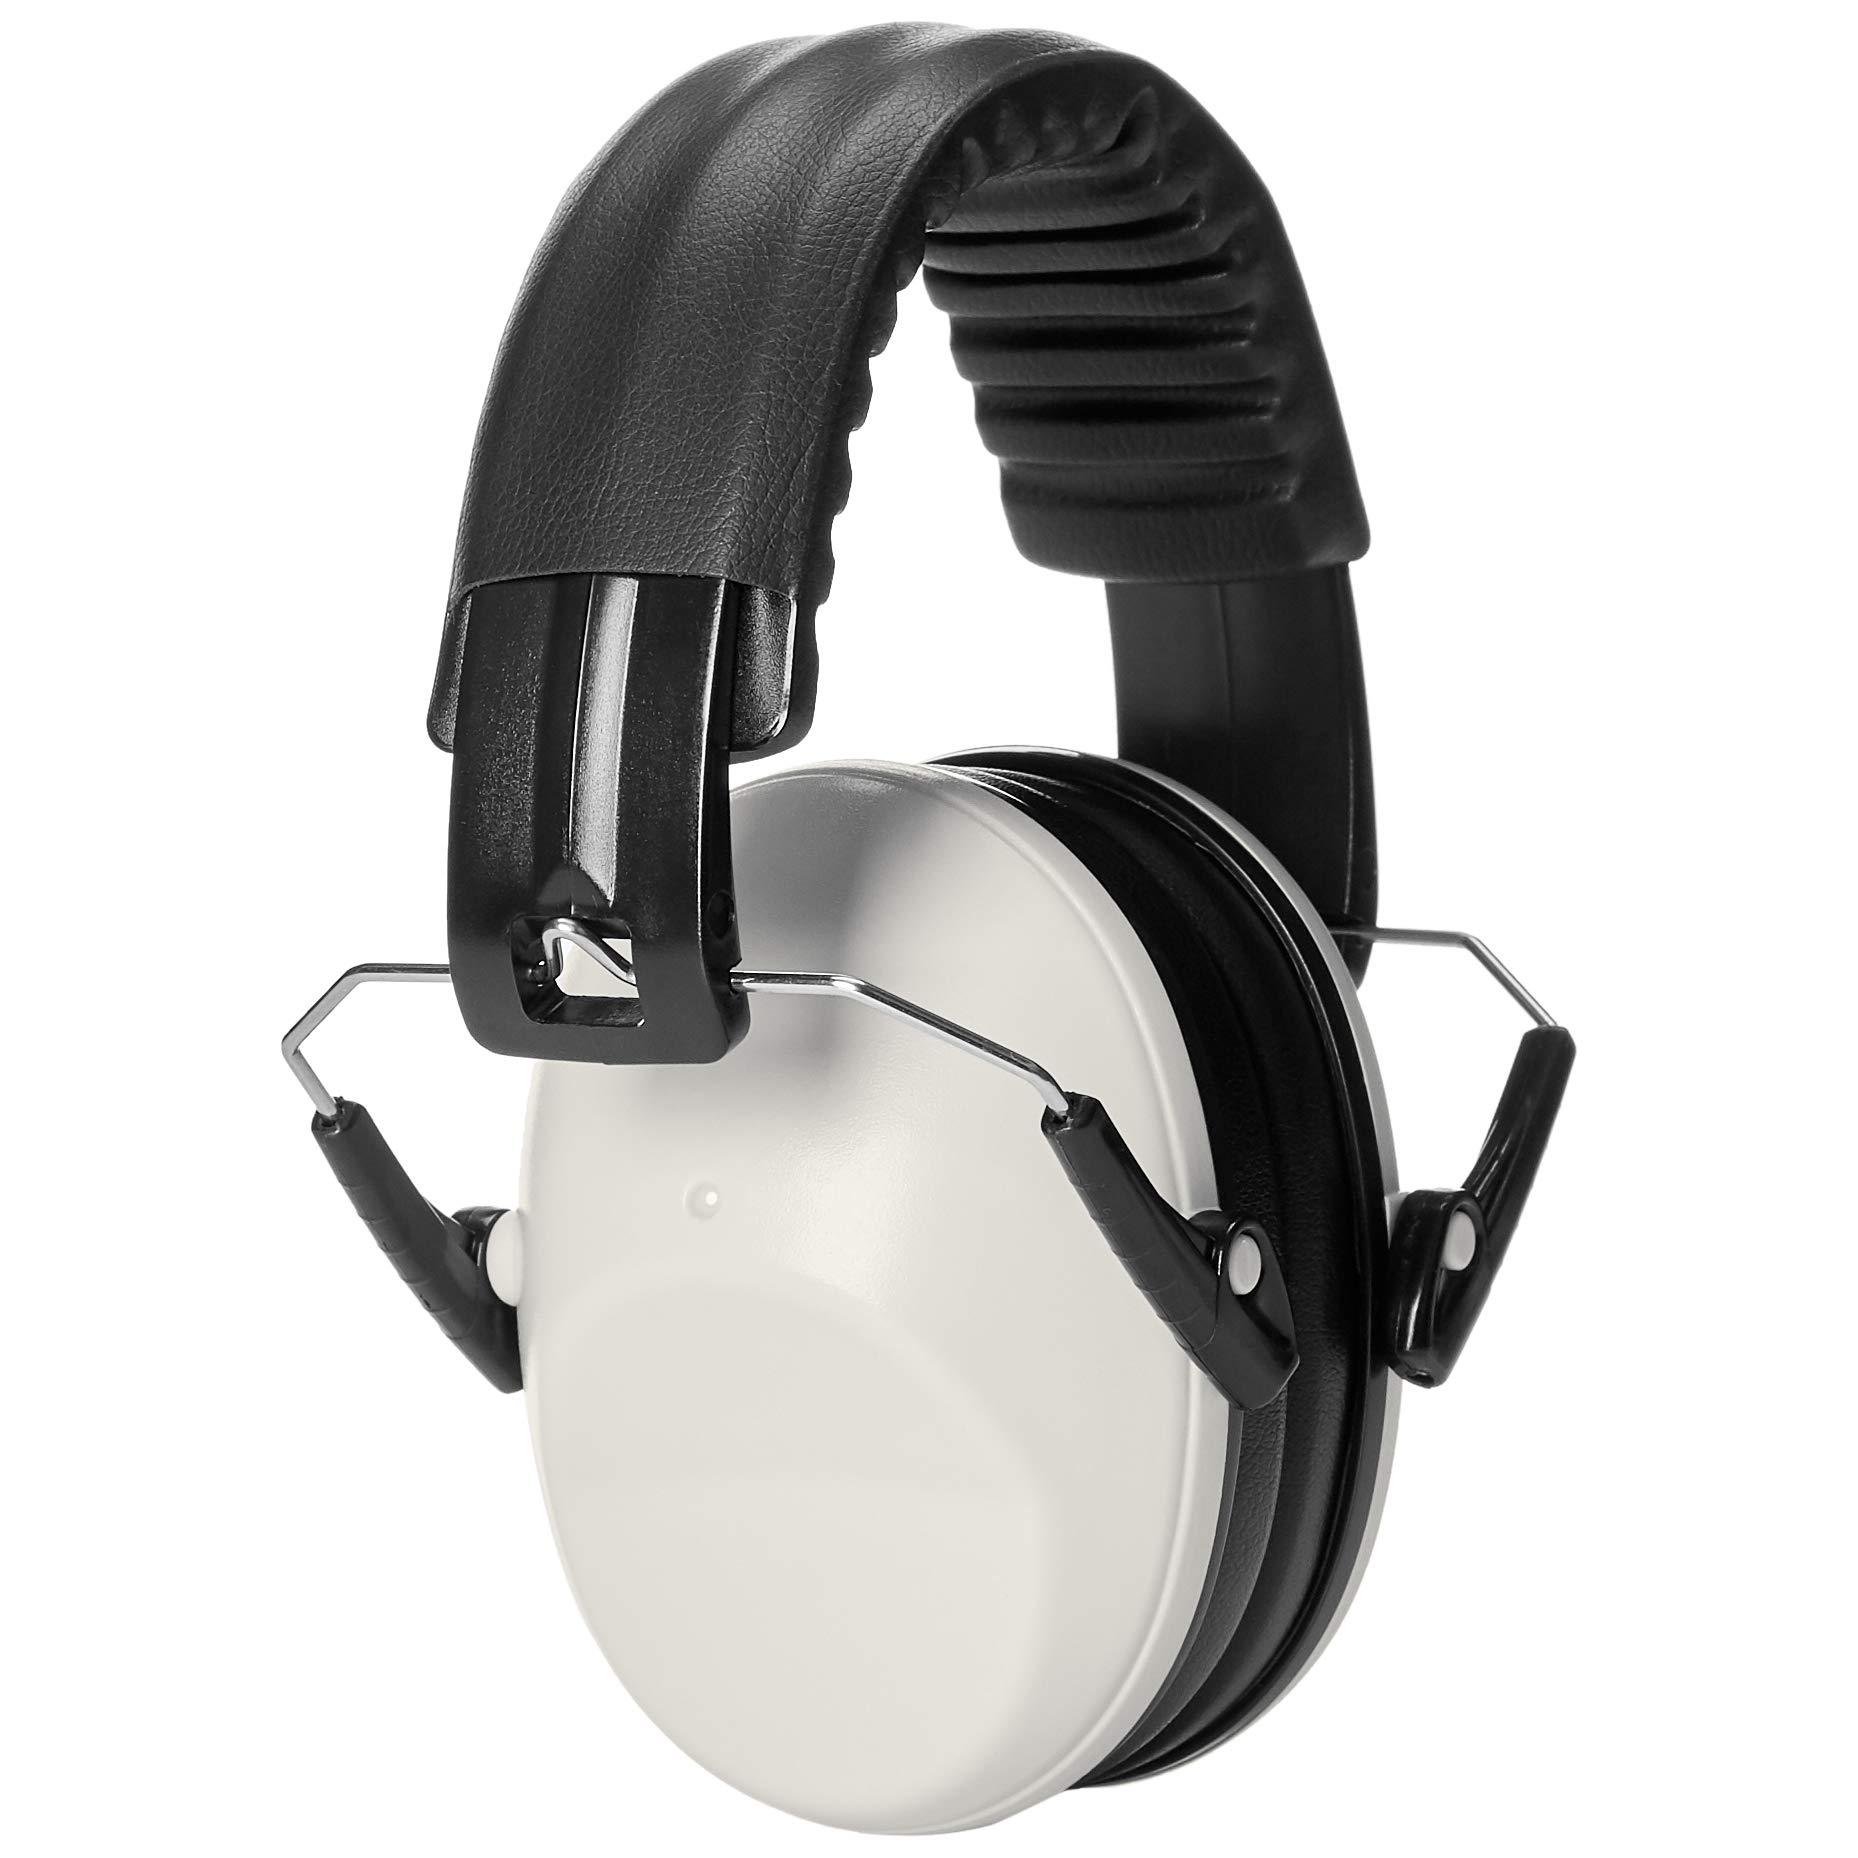 AmazonBasics Protection Safety Earmuffs White